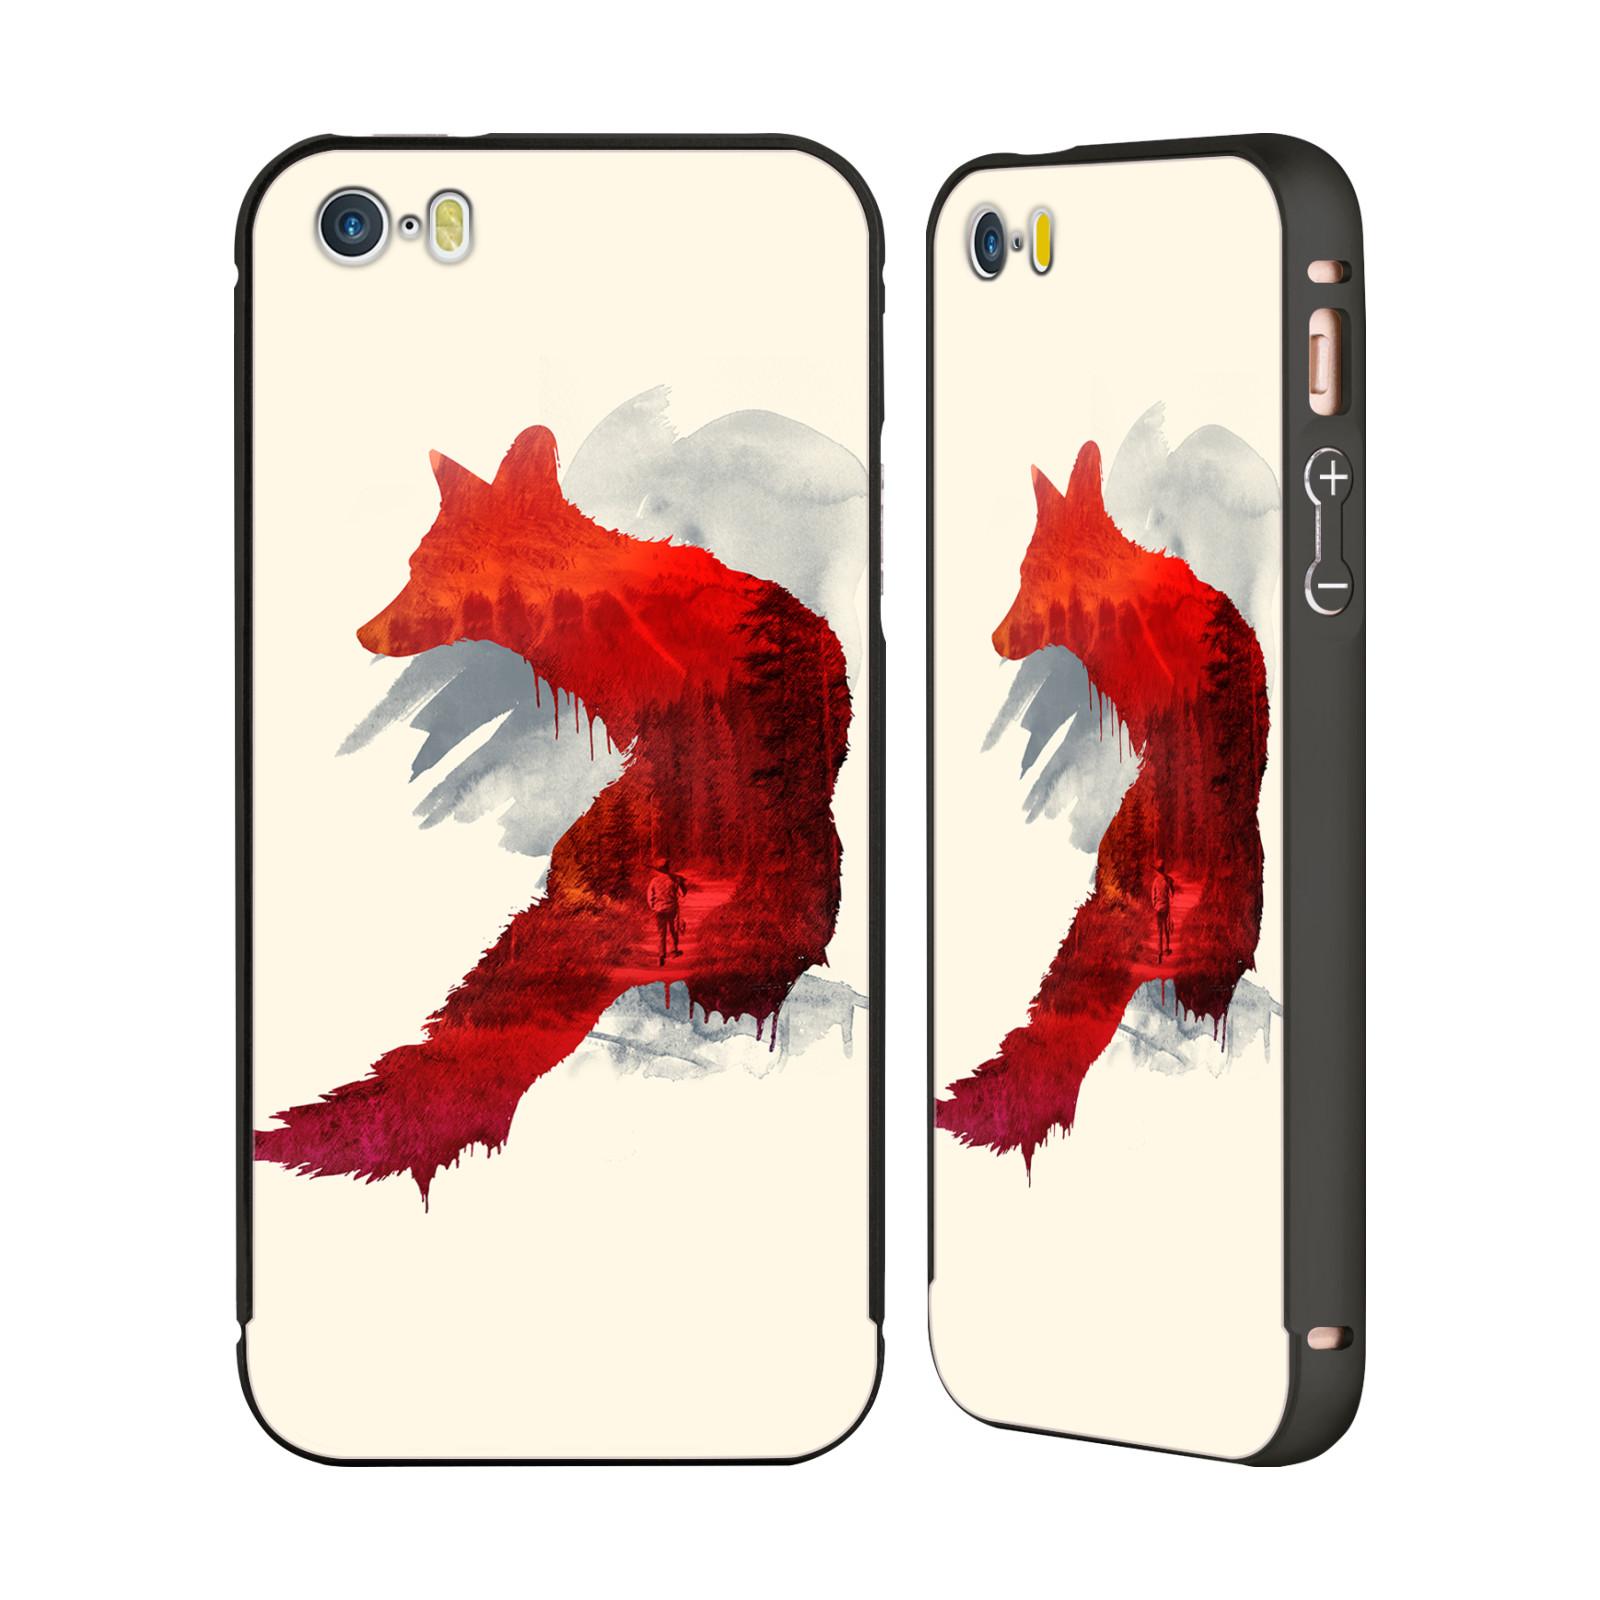 OFFICIAL-ROBERT-FARKAS-FOX-BLACK-BUMPER-SLIDER-CASE-FOR-APPLE-iPHONE-PHONES